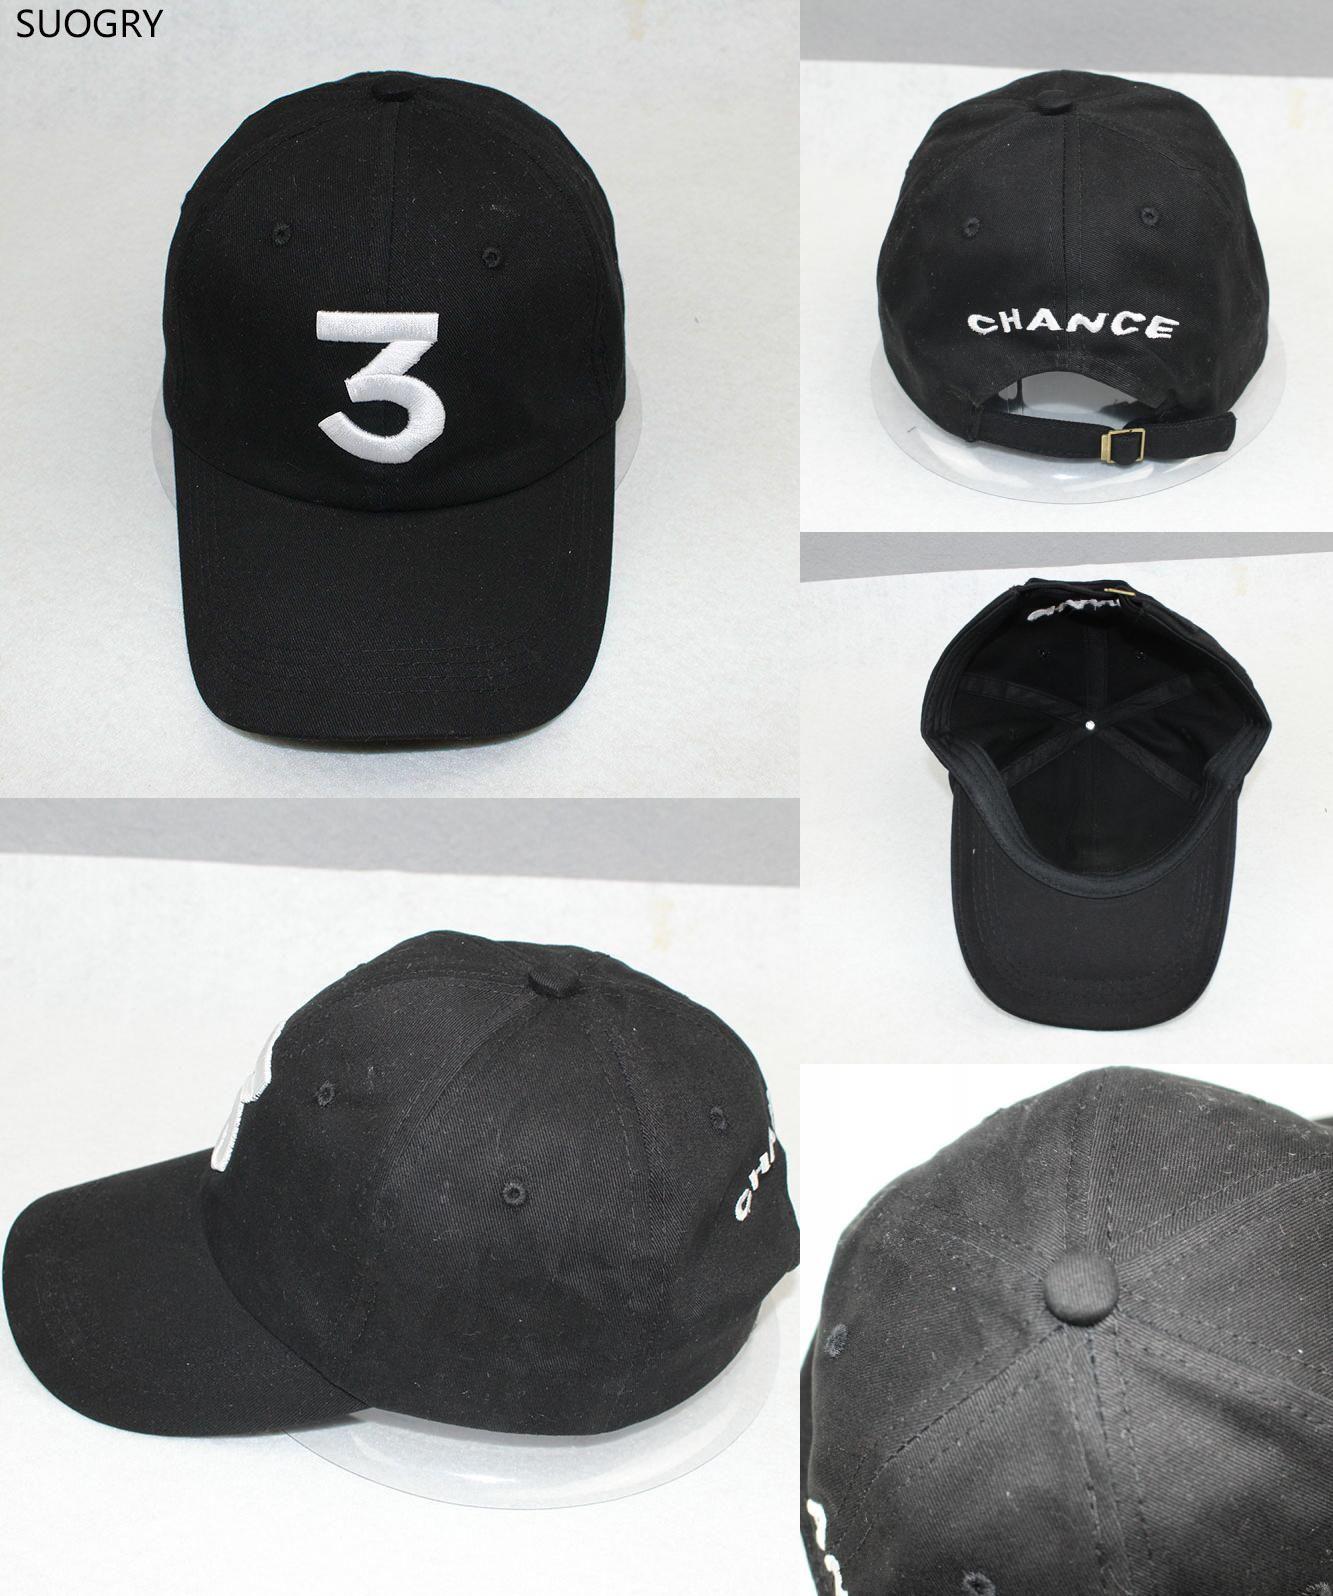 6b8bf740b26  Visit to Buy  Popular chance the rapper 3 Hat Cap Black Letter Embroidery  Baseball Cap Hip Hop Streetwear Strapback Snapback Sun Hat Bone   Advertisement